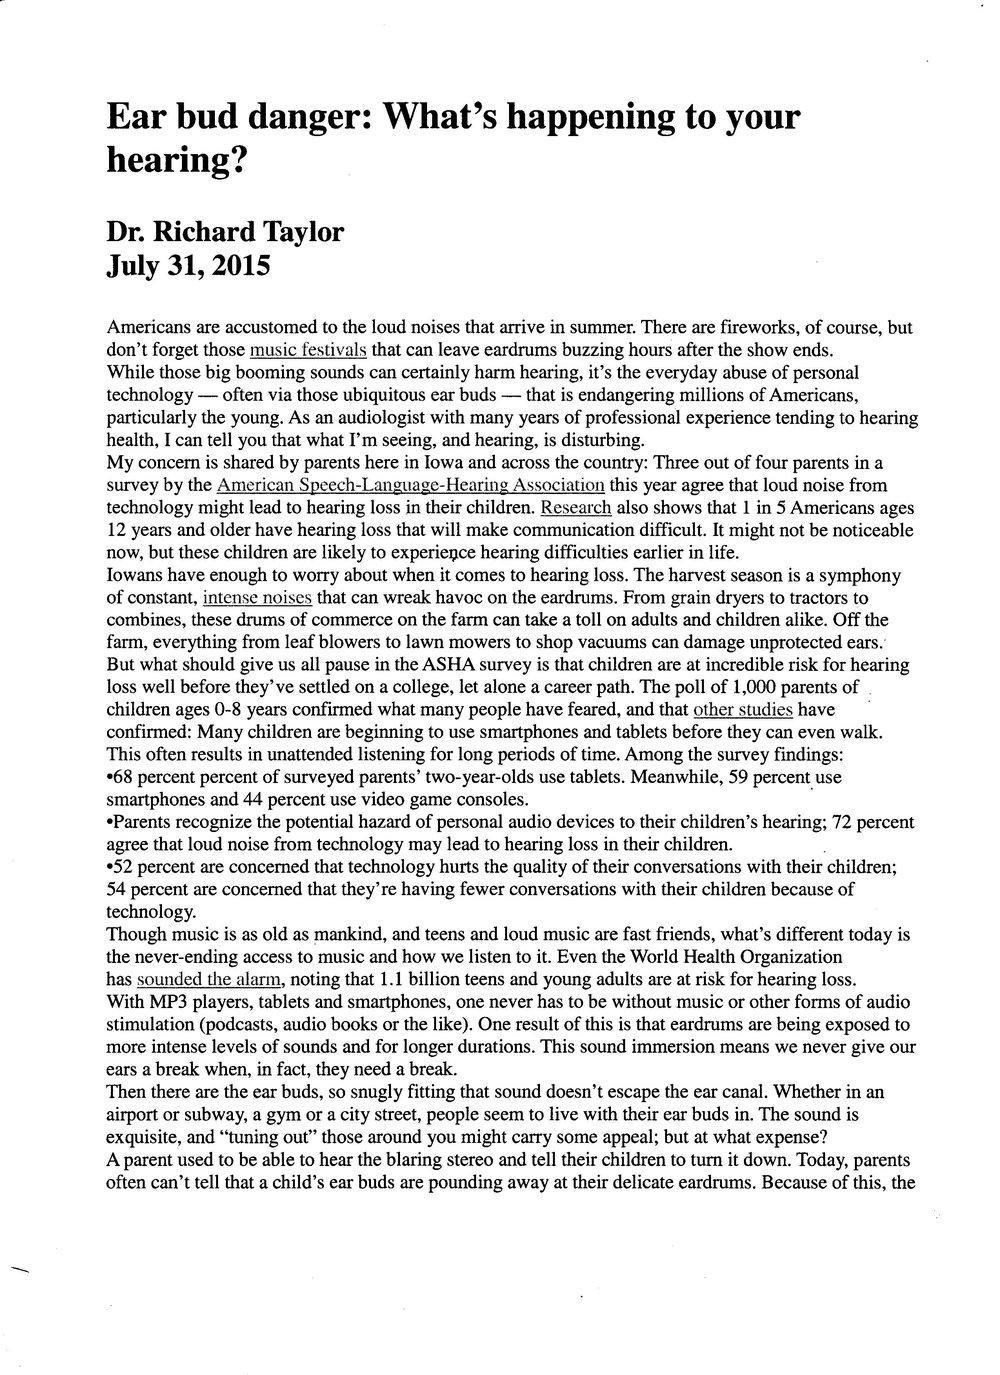 Richard Tyler 1.jpg